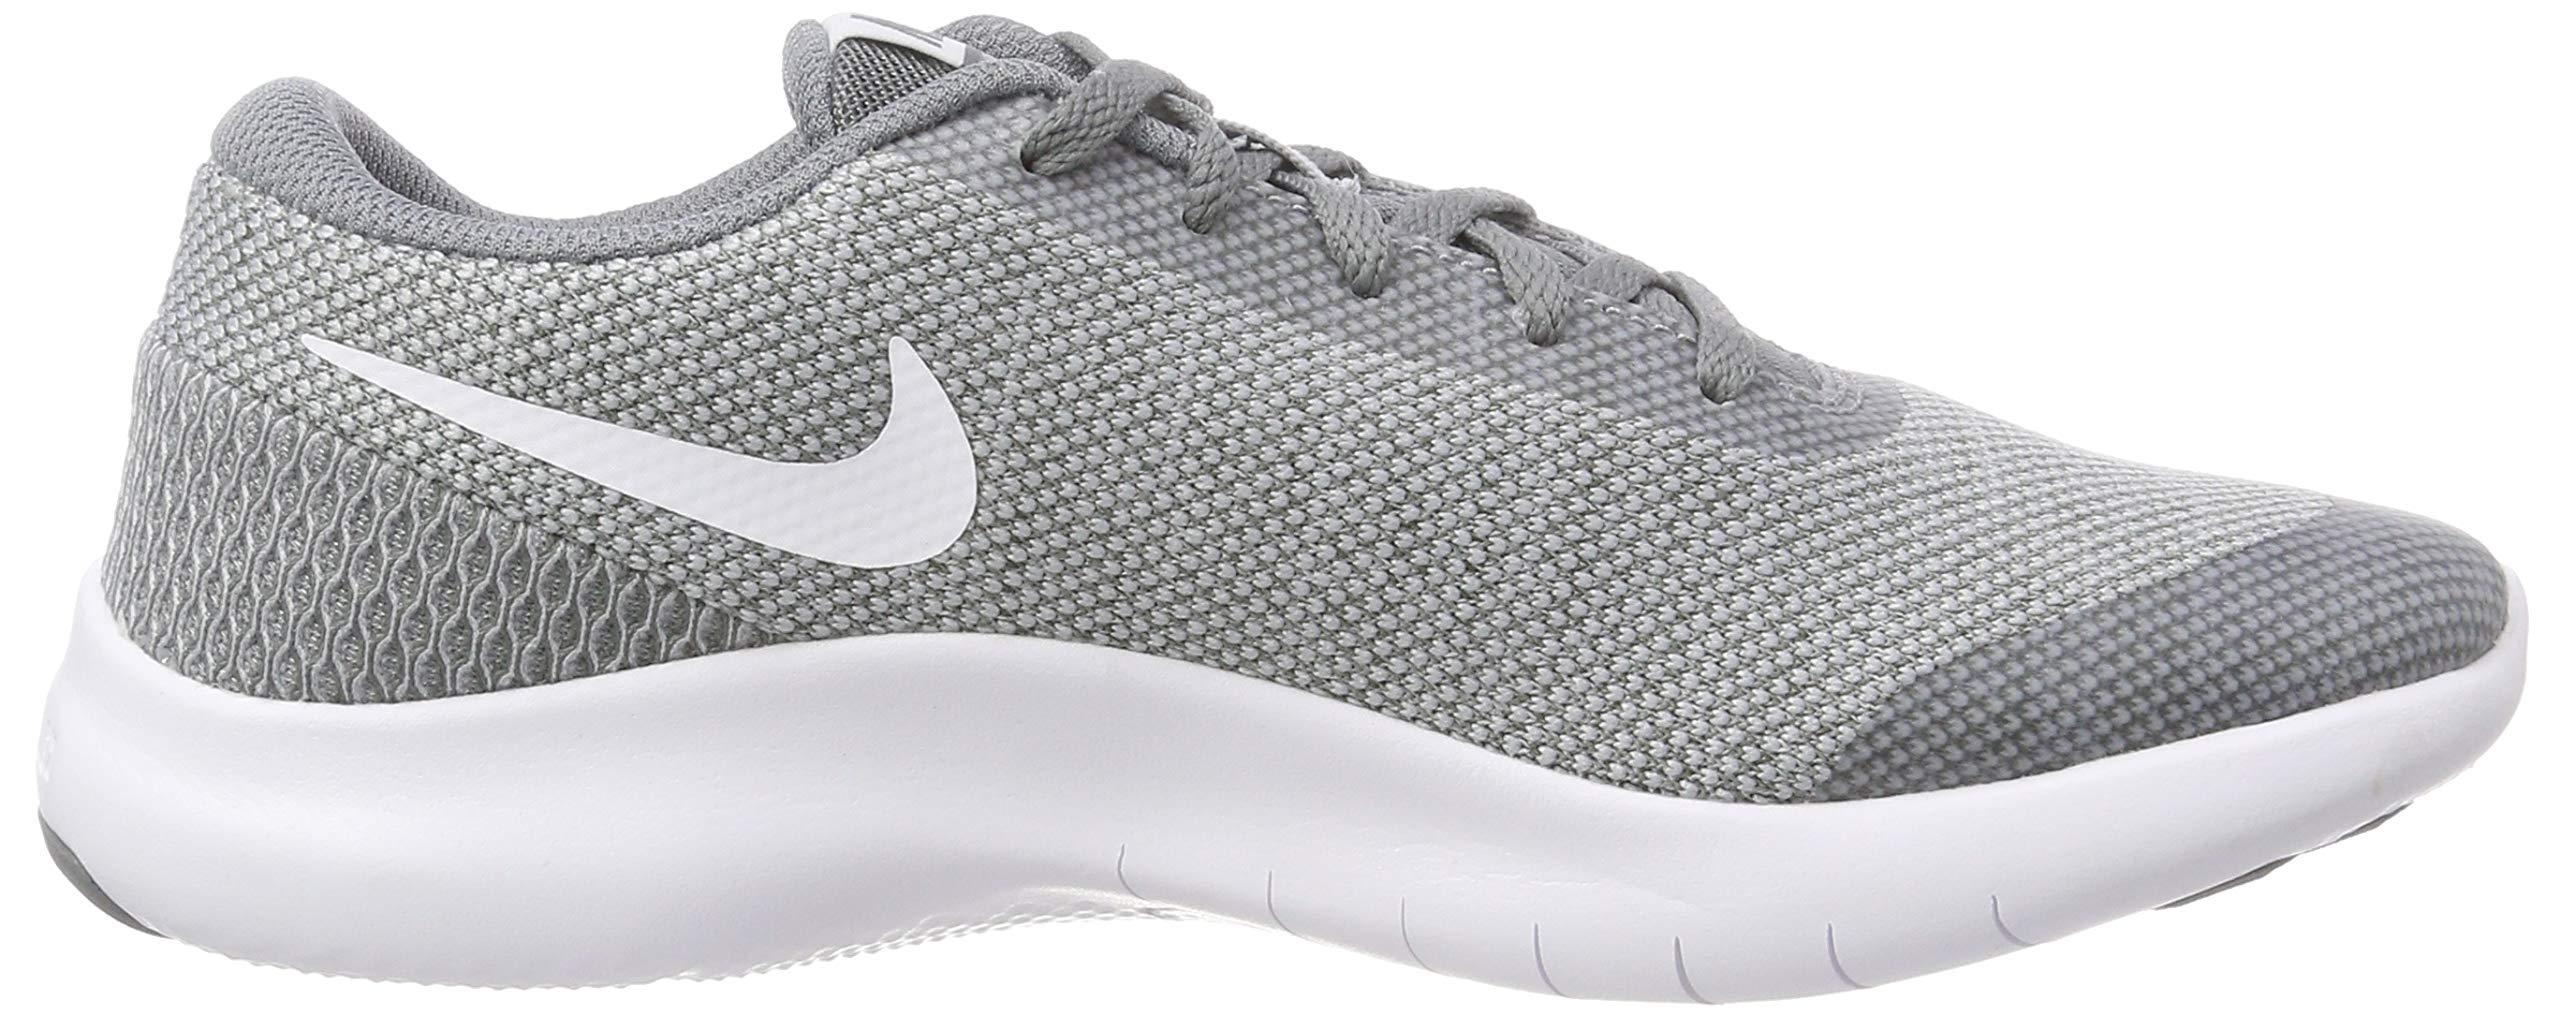 Nike Flex Experience Rn 7 (gs) Big Kids 943284-003 Size 4 by Nike (Image #6)